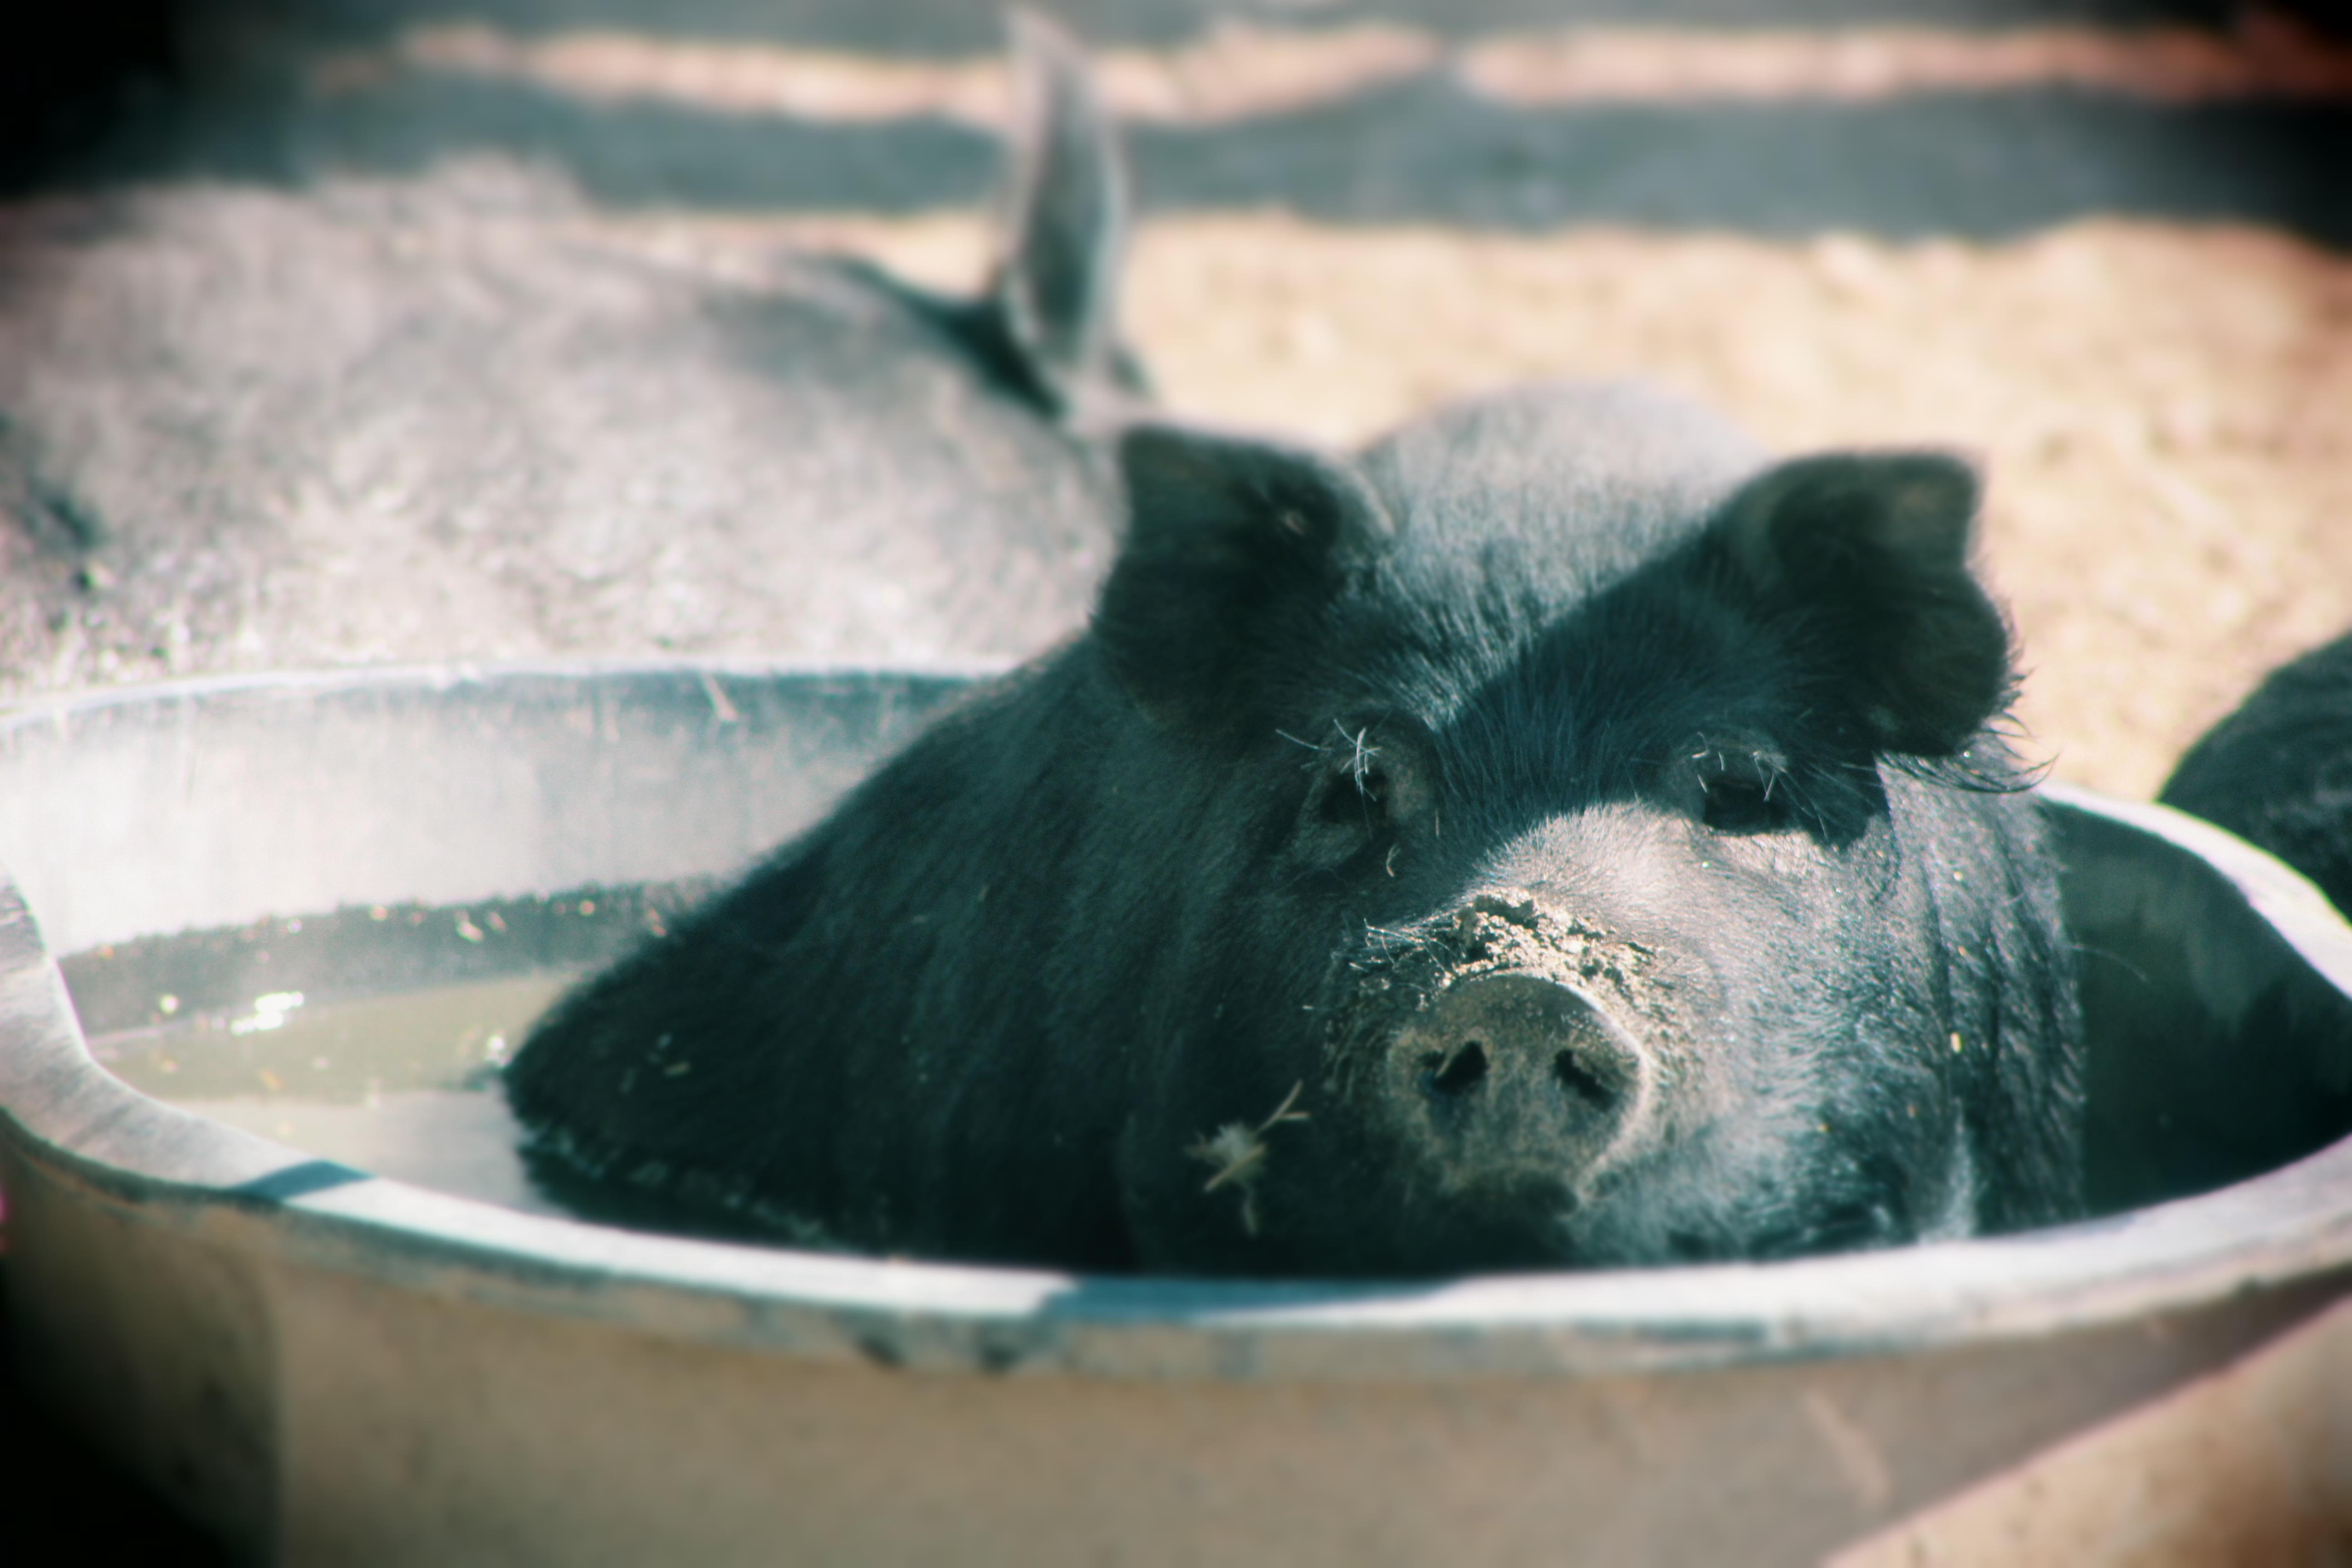 An American Guinea Hog Piglet endangered heritage farm animal